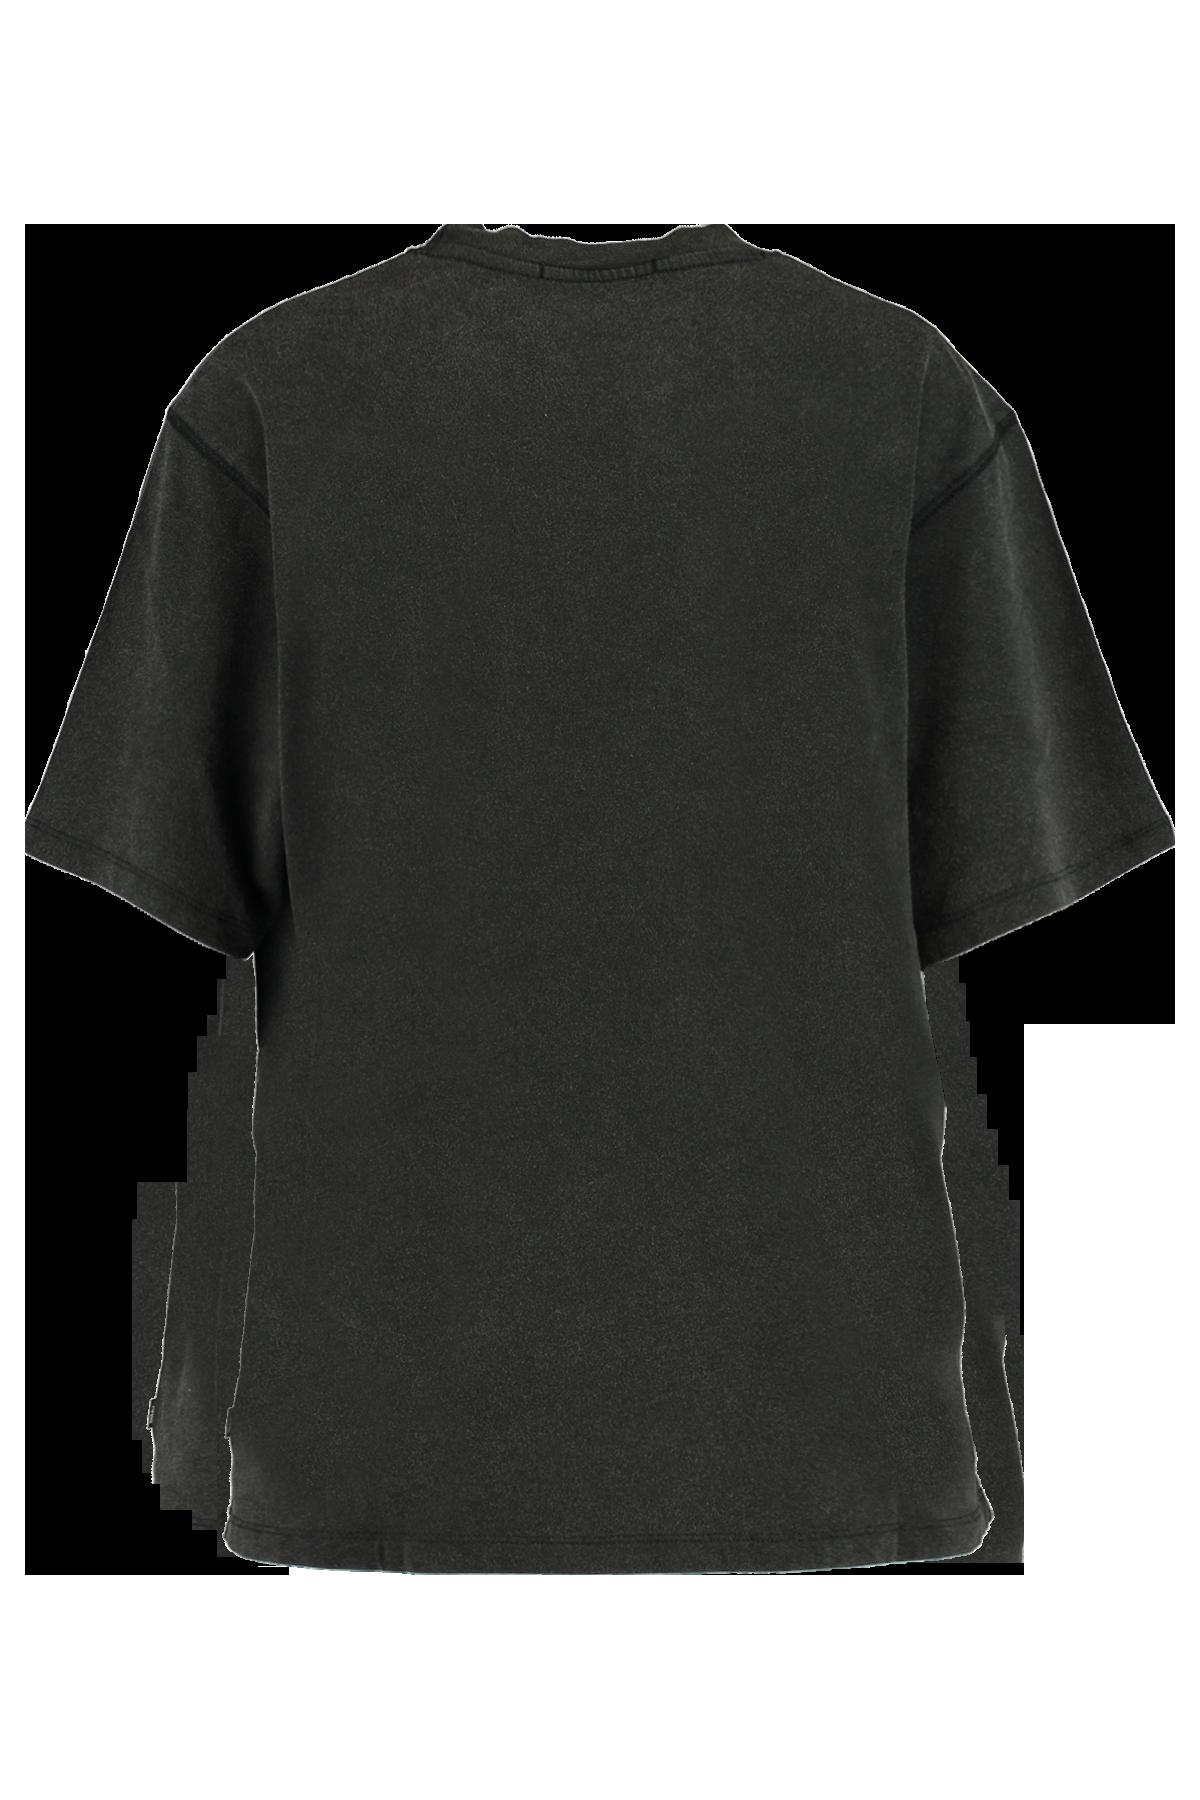 T-shirt Ester